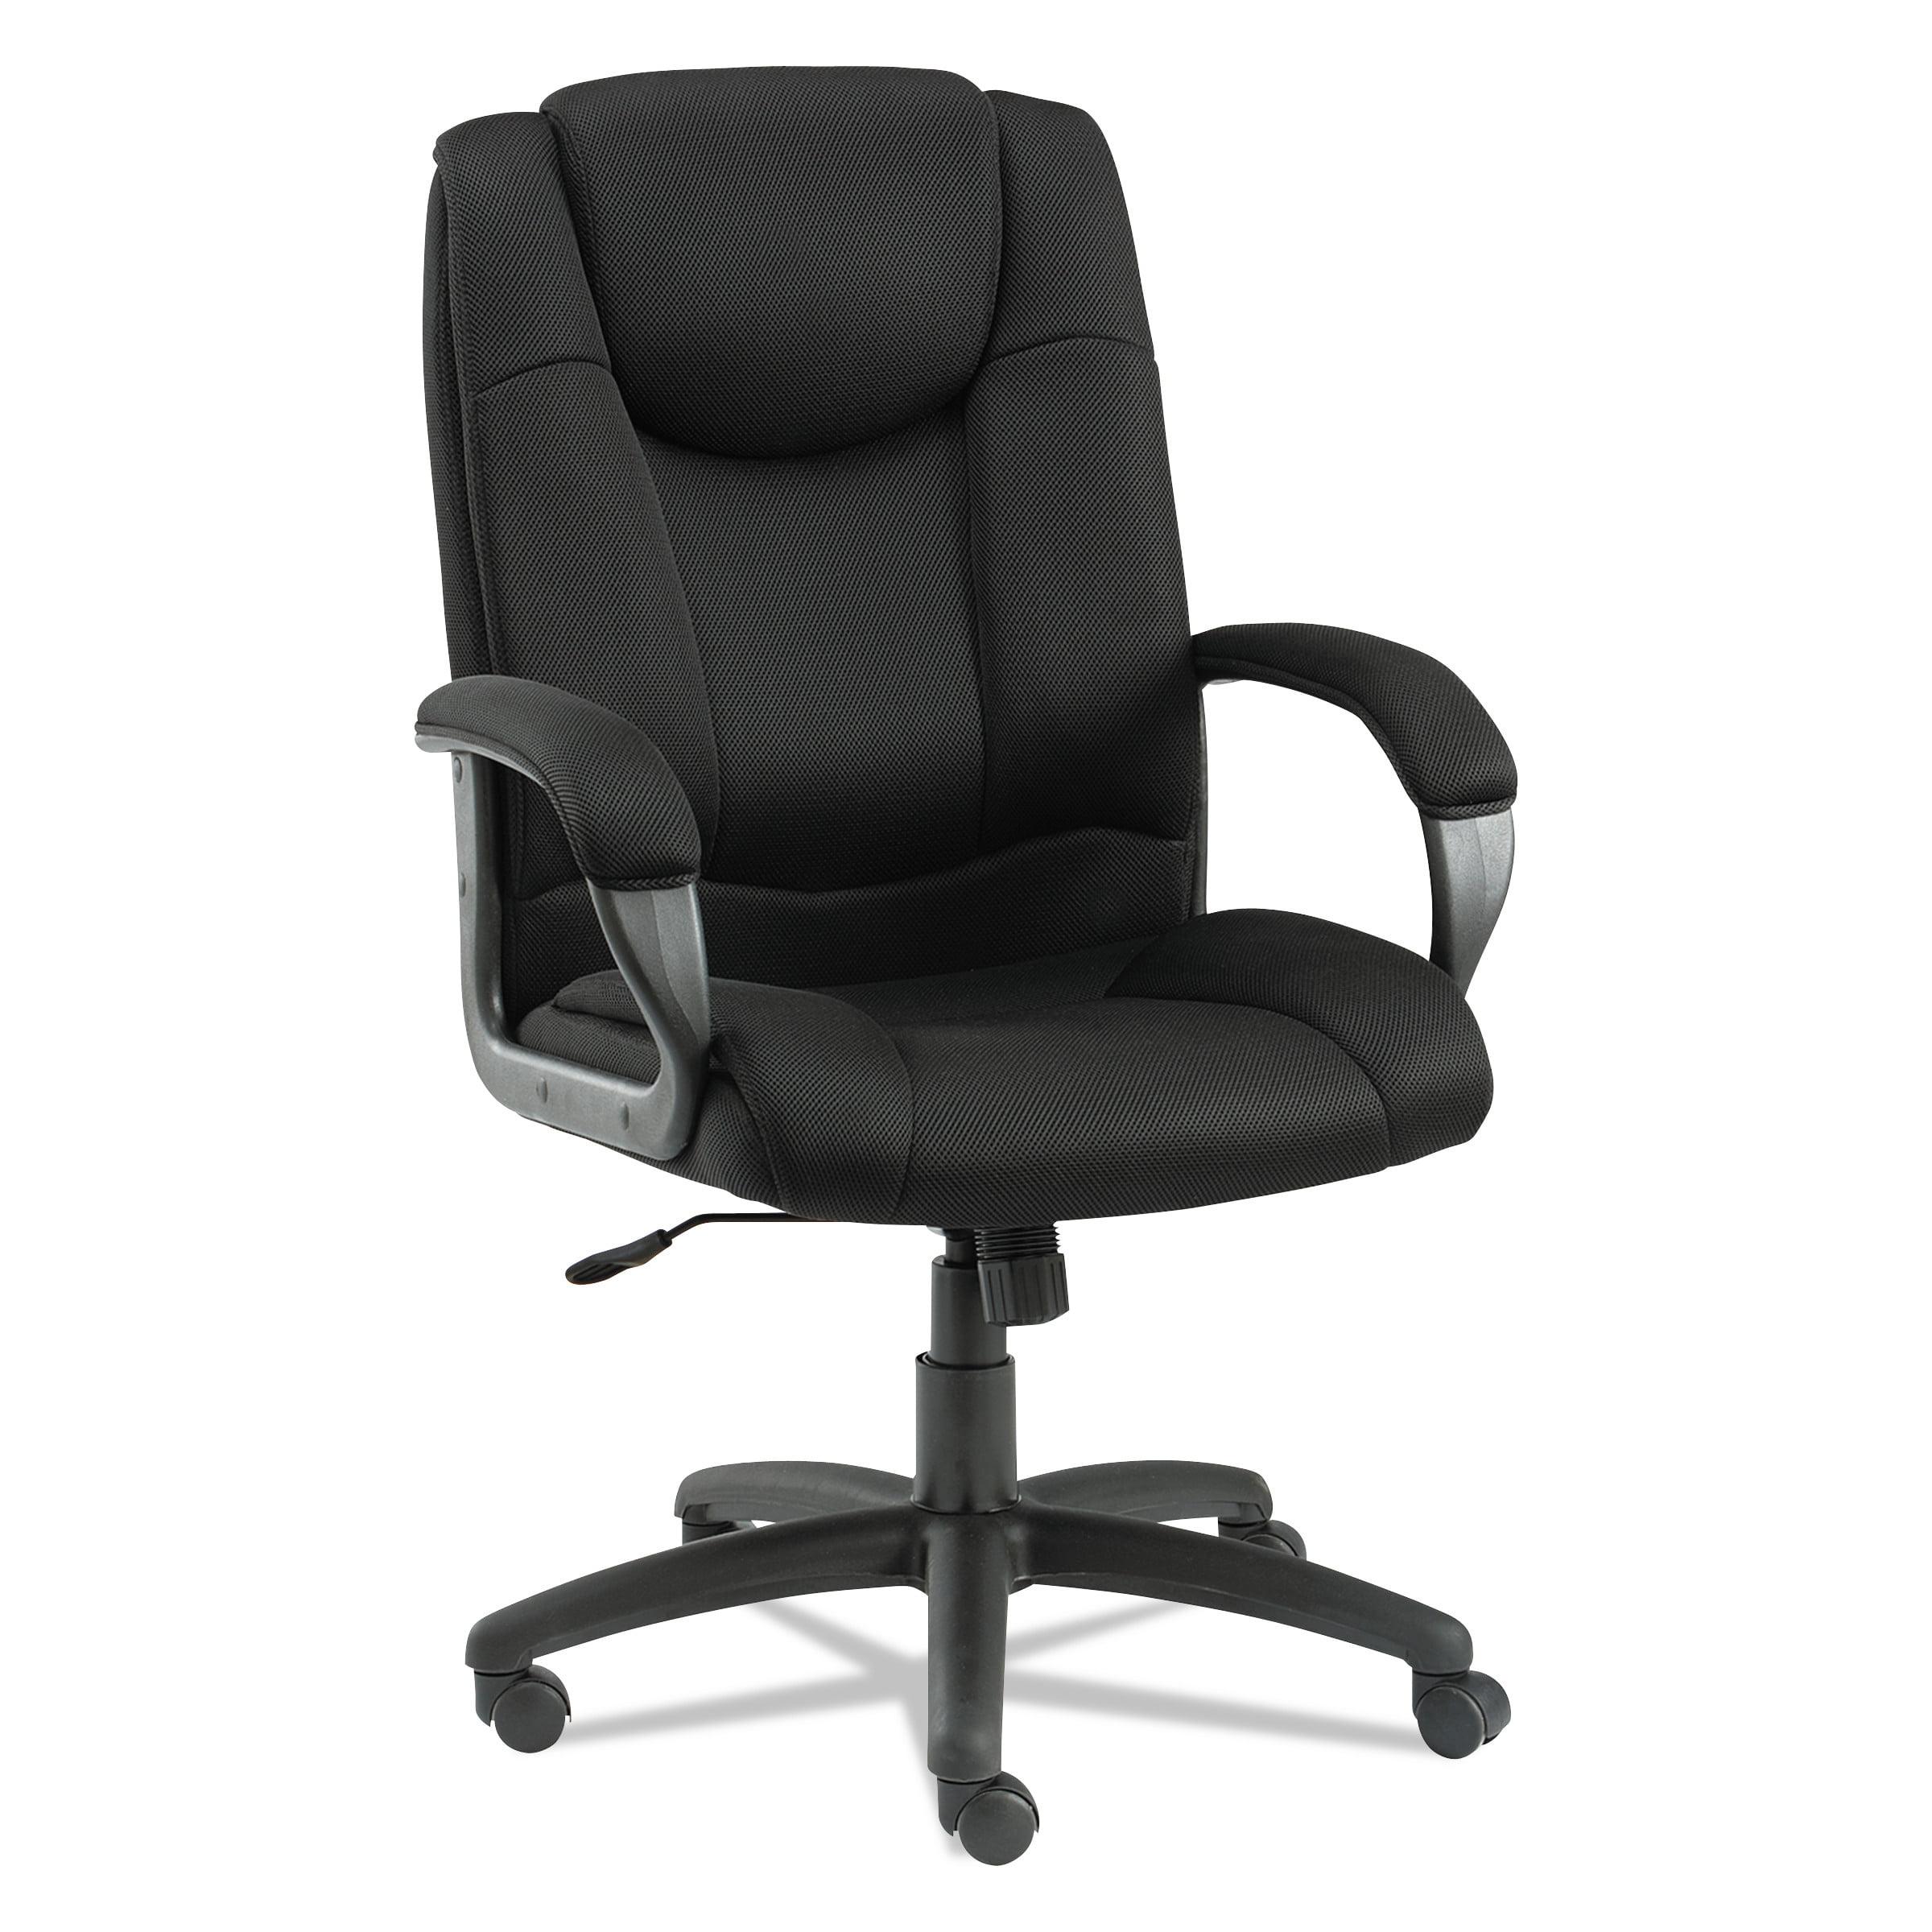 Alera Logan Series Mesh High-Back Swivel Tilt Chair, Black by ALERA